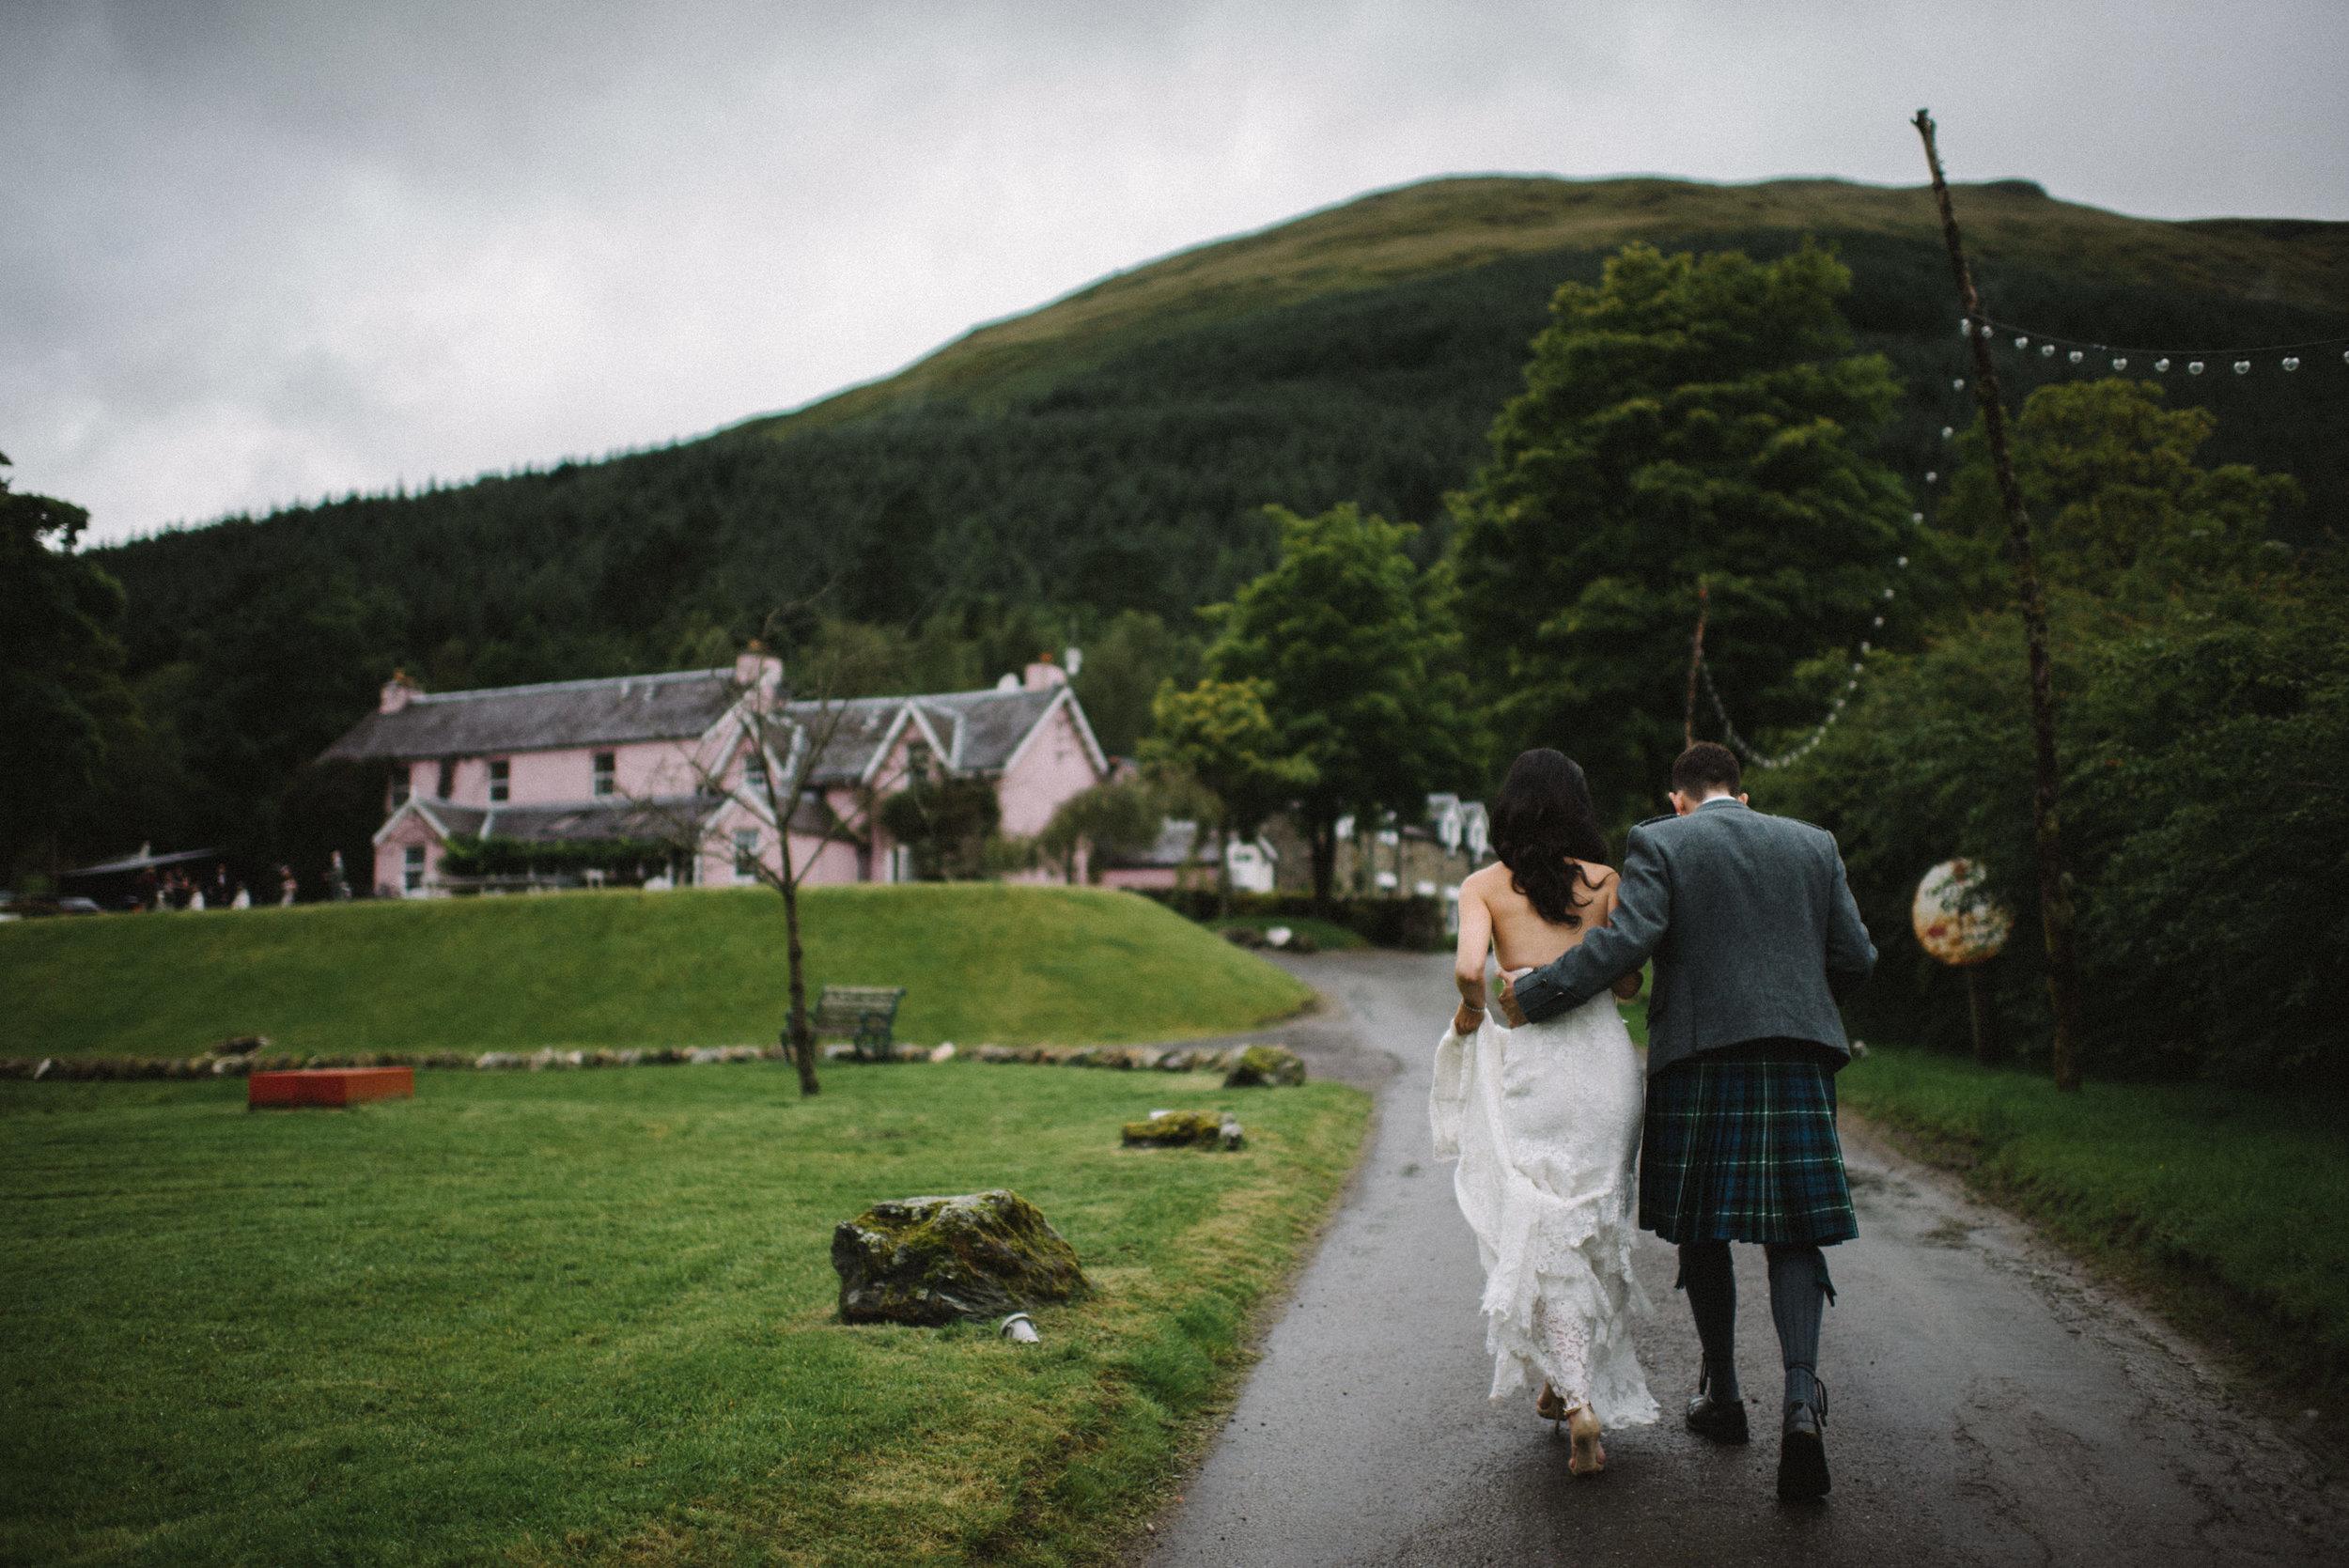 0103-LISA-DEVINE-PHOTOGRAPHY-ALTERNATIVE-WEDDING-PHOTOGRAPHY-SCOTLAND-DESTINATION-WEDDINGS-GLASGOW-WEDDINGS-COOL-WEDDINGS-STYLISH-WEDDINGS.JPG